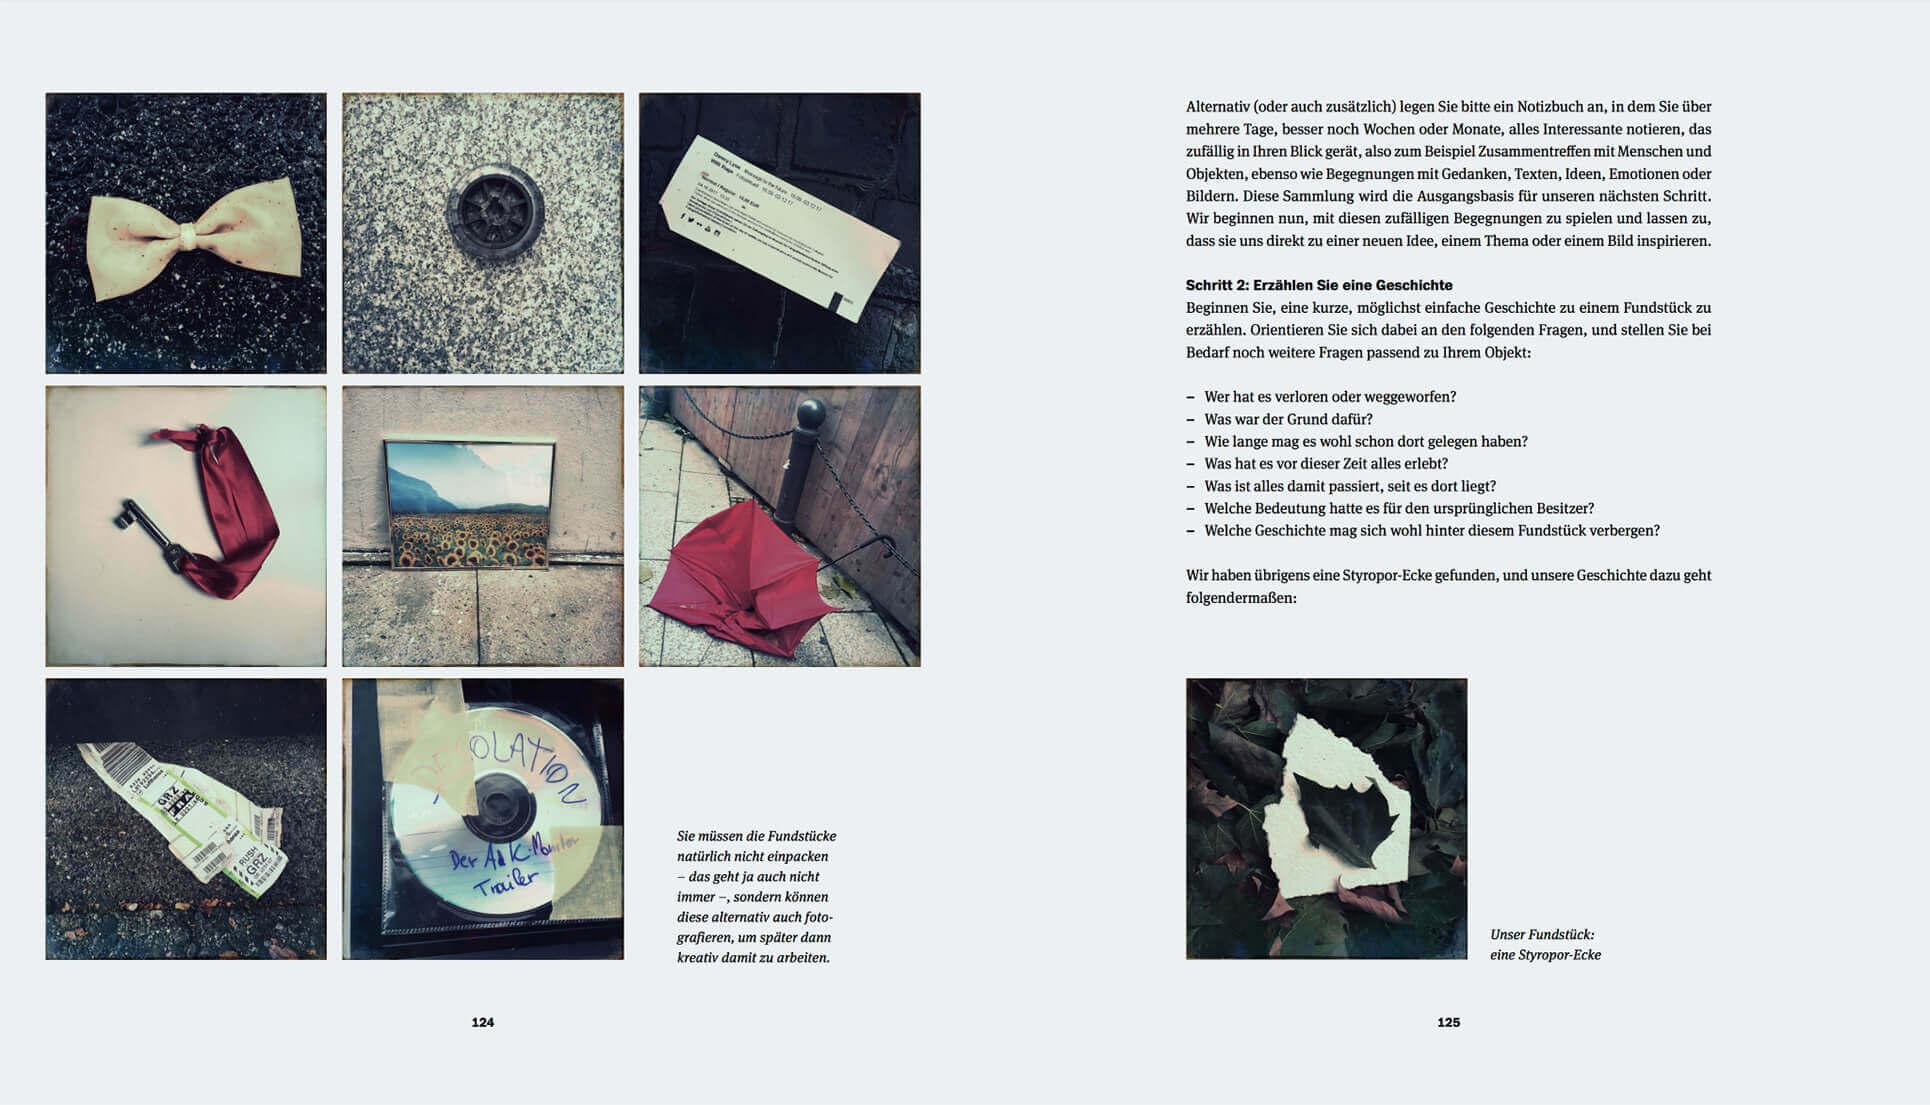 Heidi + Robert Mertens: Der kreative Fotograf